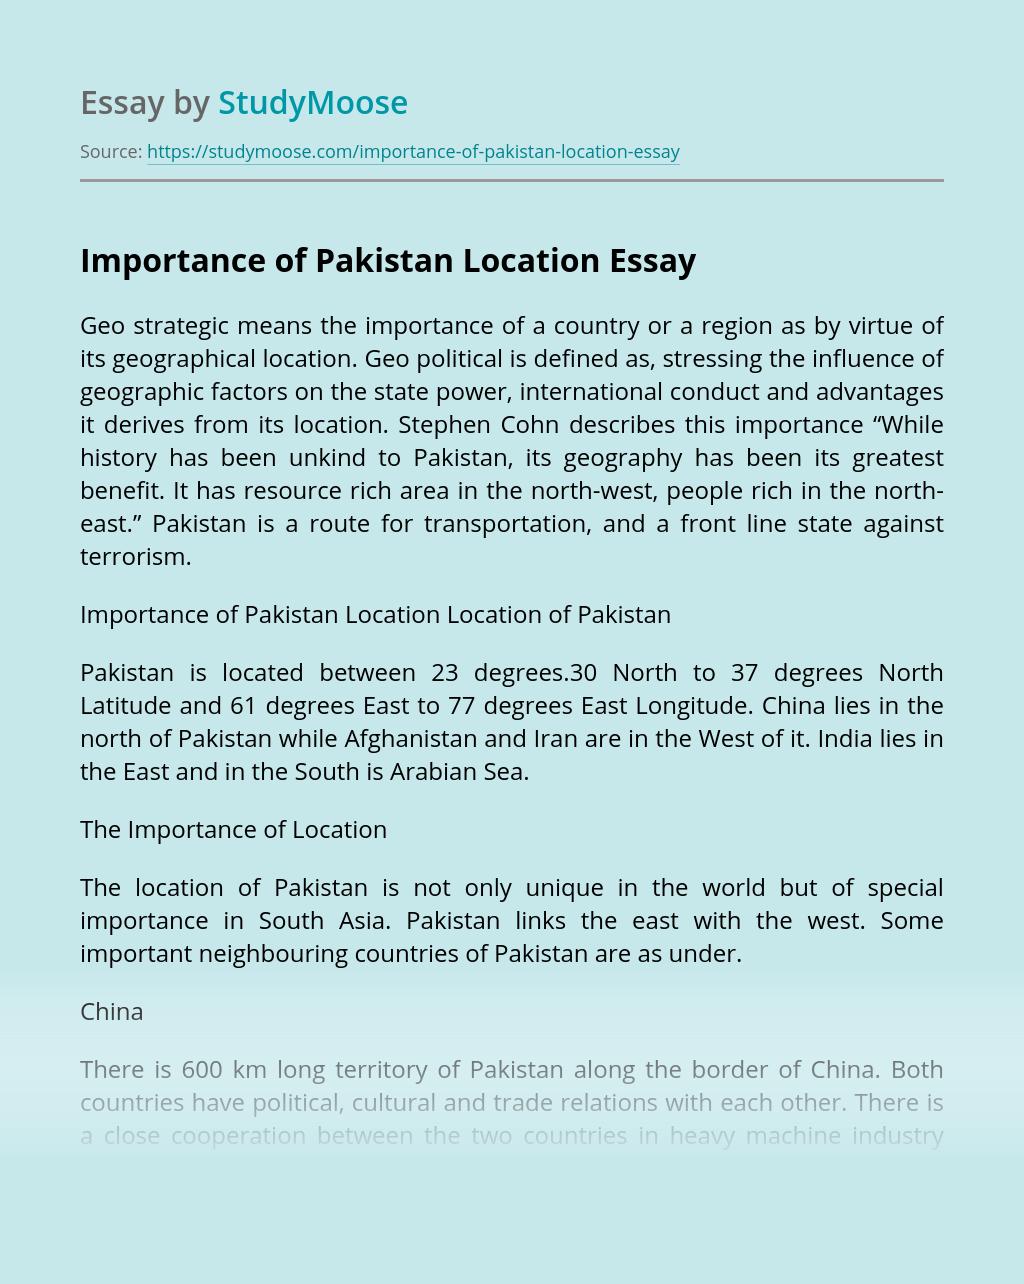 Importance of Pakistan Location